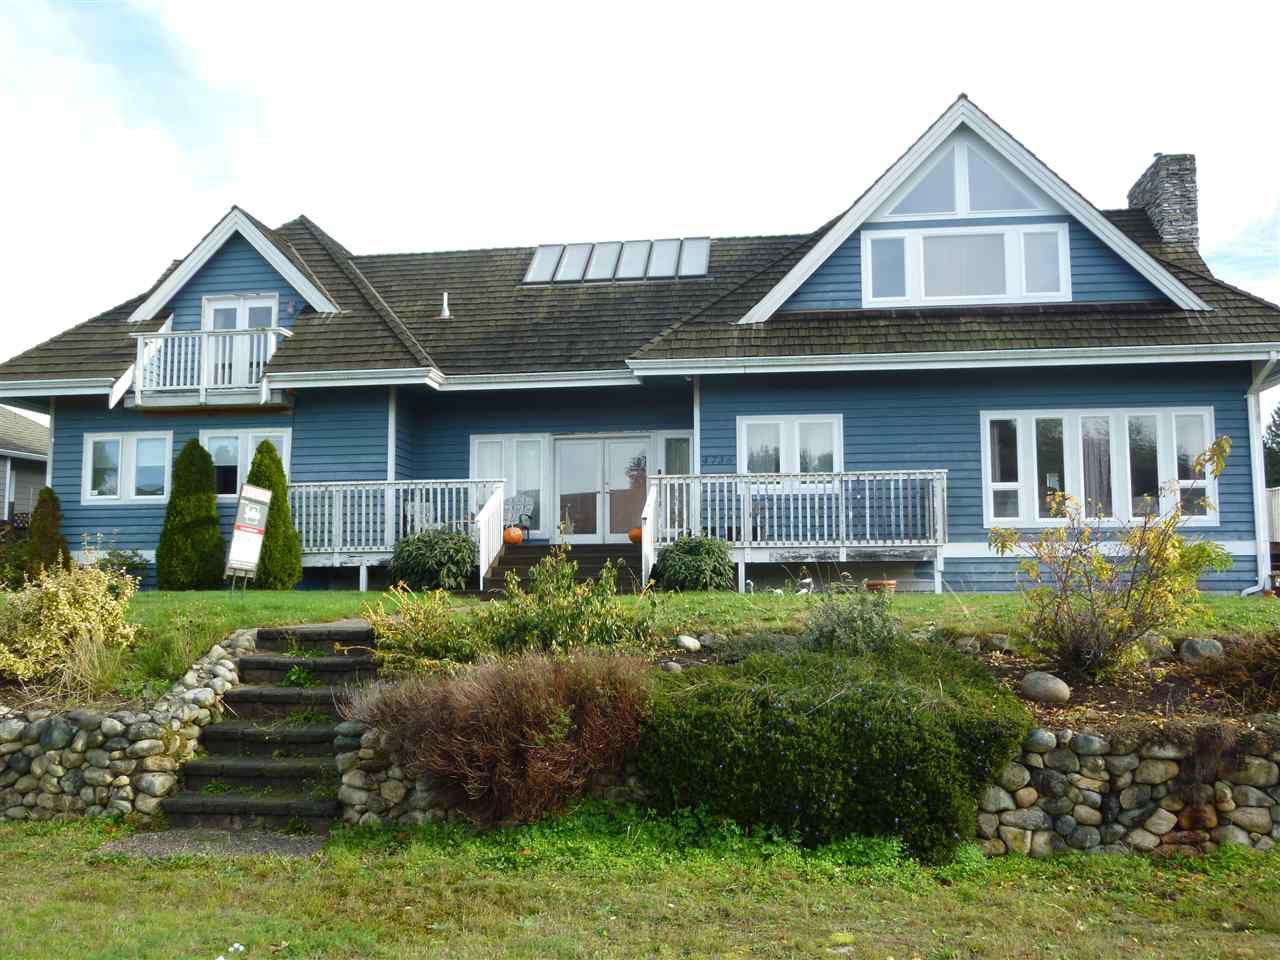 Main Photo: 4736 TAMARACK Place in Sechelt: Sechelt District House for sale (Sunshine Coast)  : MLS®# R2014730